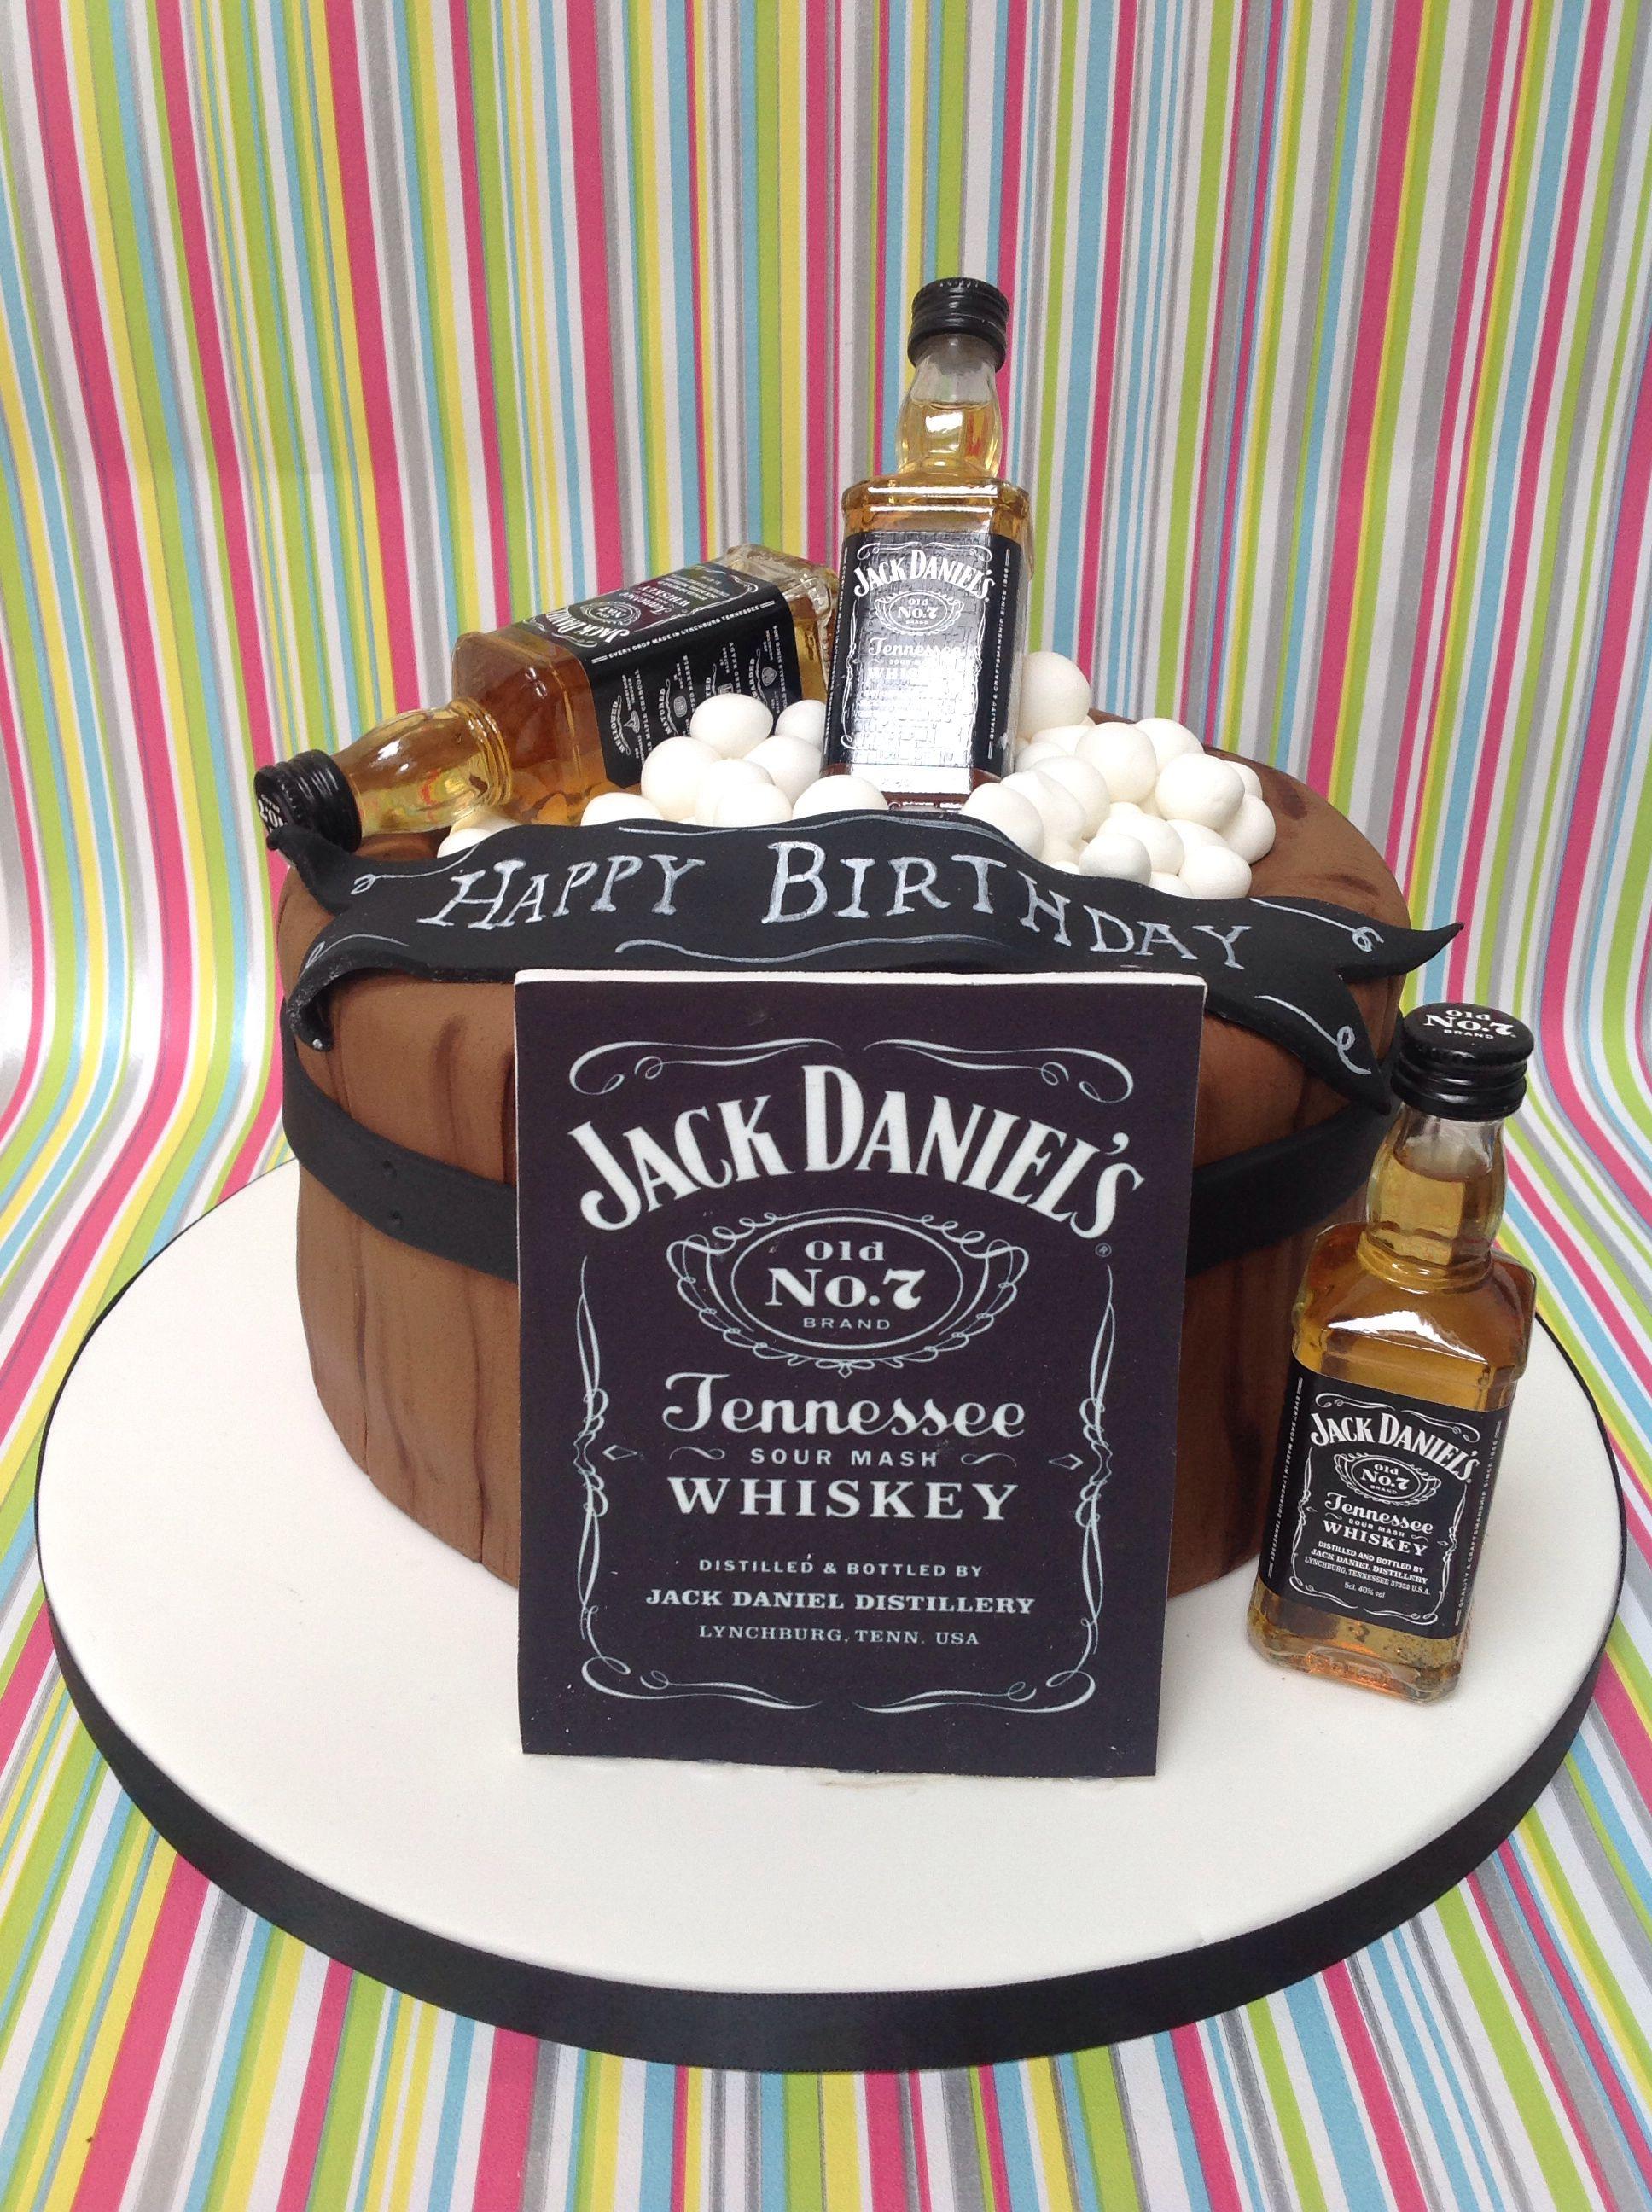 Jack daniels cake birthday cakes for men jack daniels